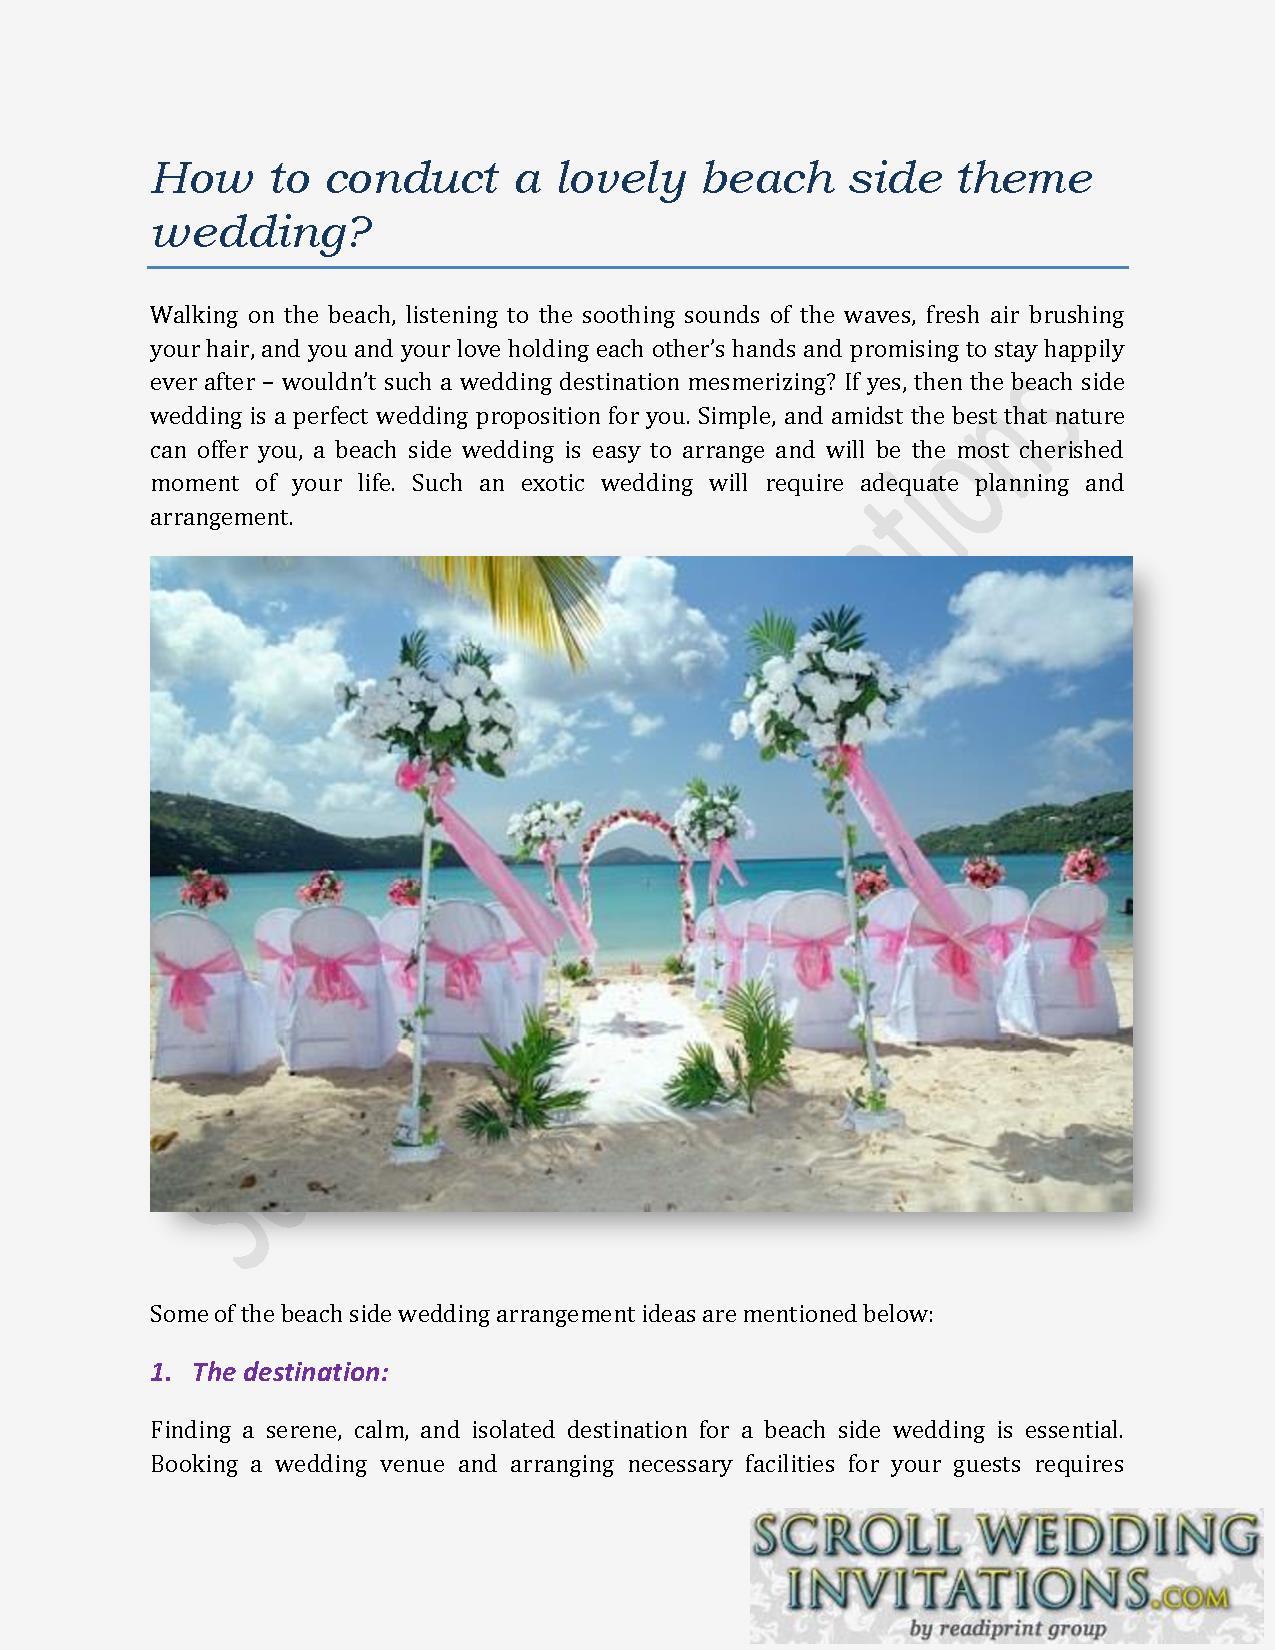 beach side theme wedding powerpoint presentation ppt, Powerpoint templates